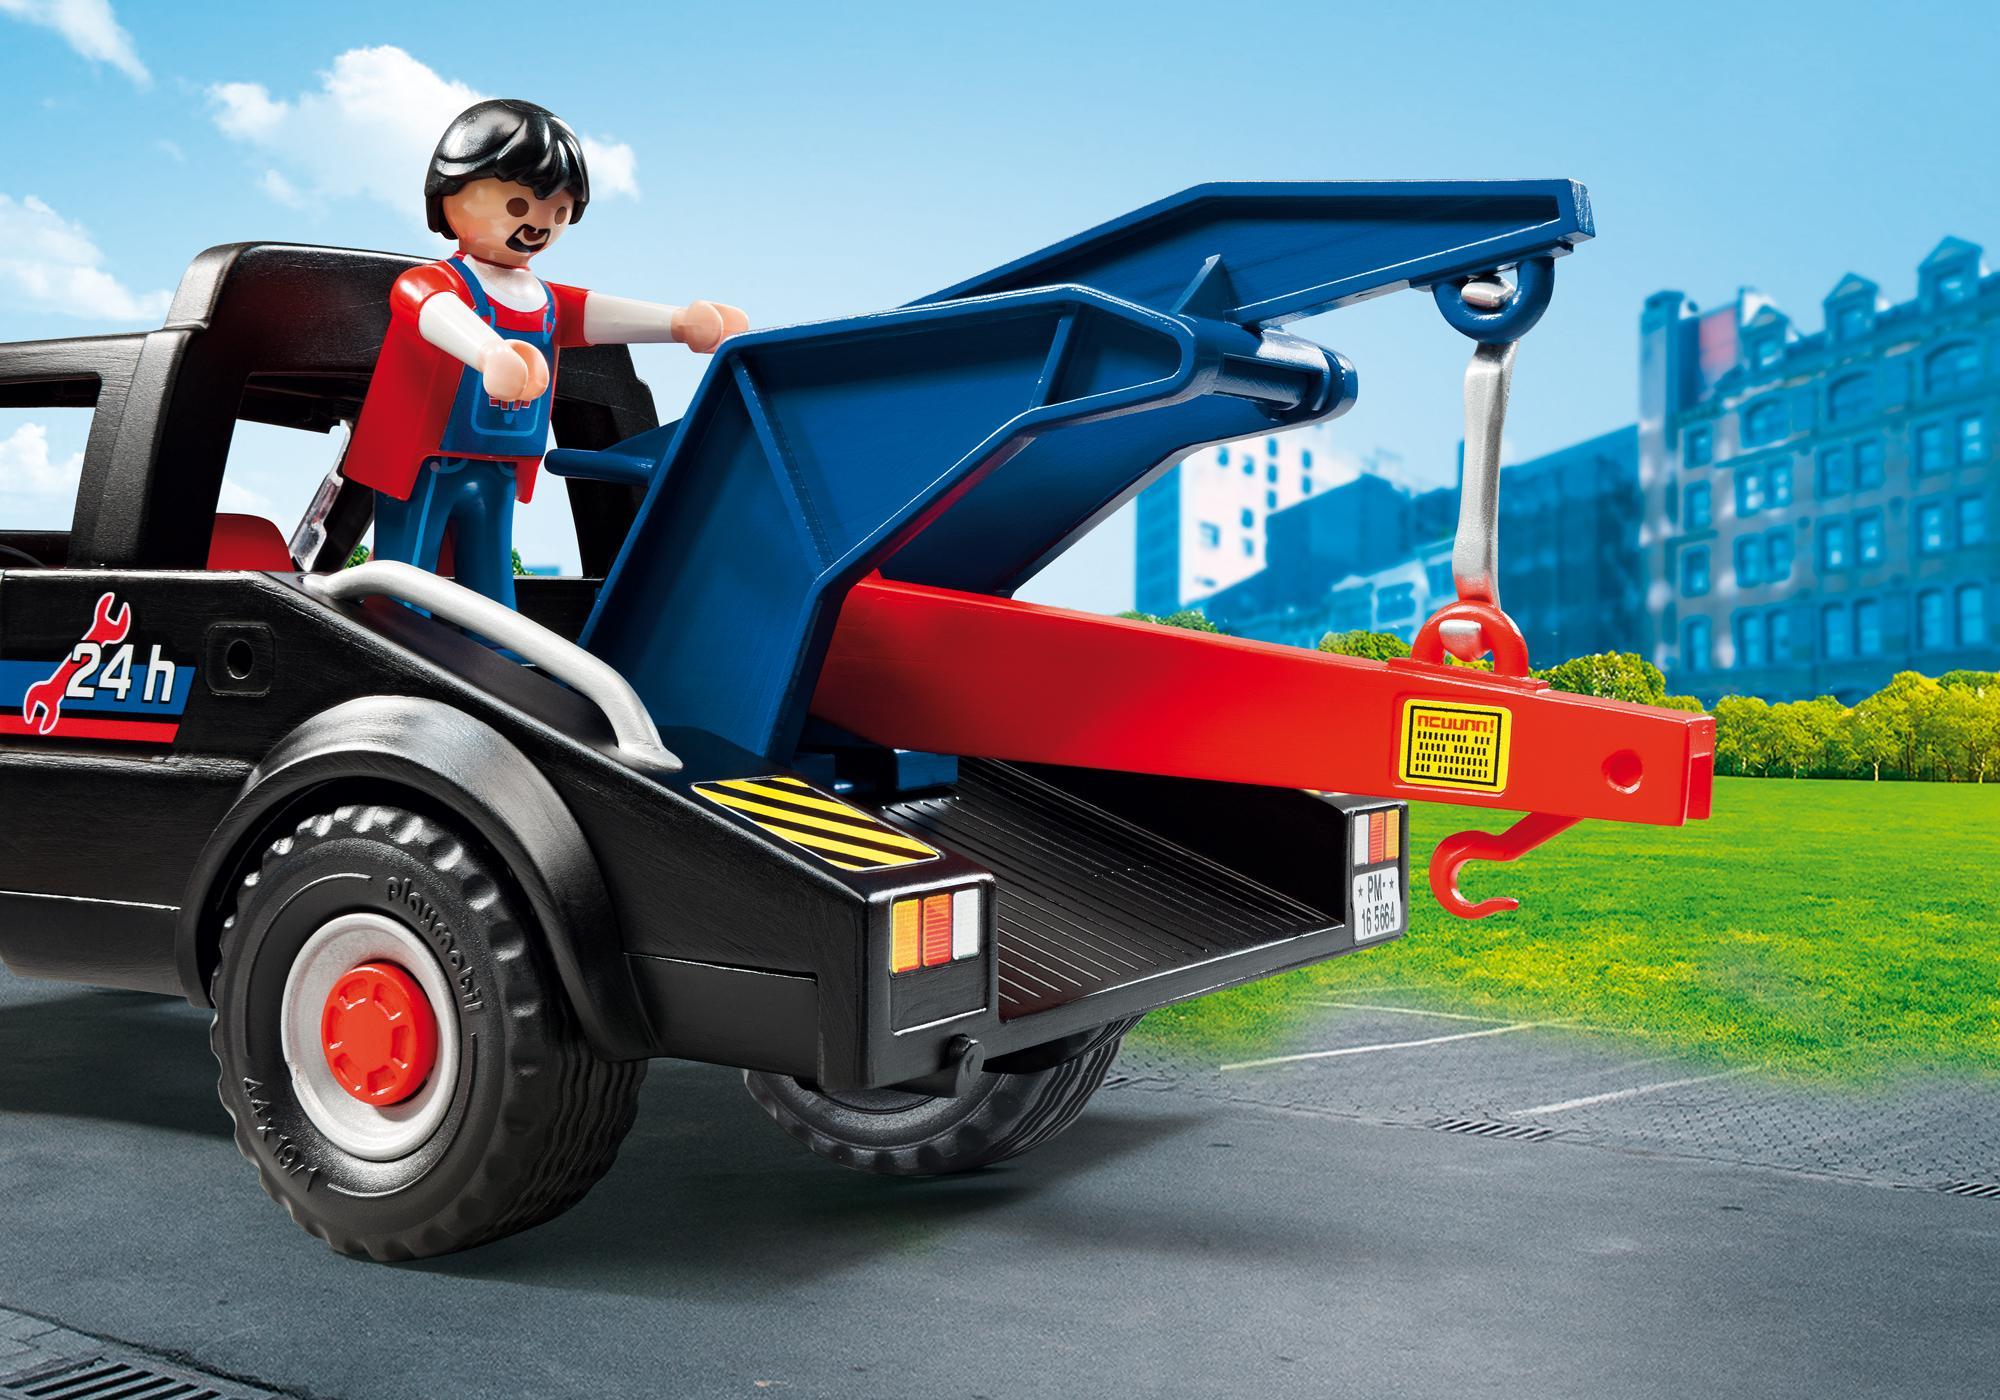 http://media.playmobil.com/i/playmobil/5664_product_extra2/Tow Truck